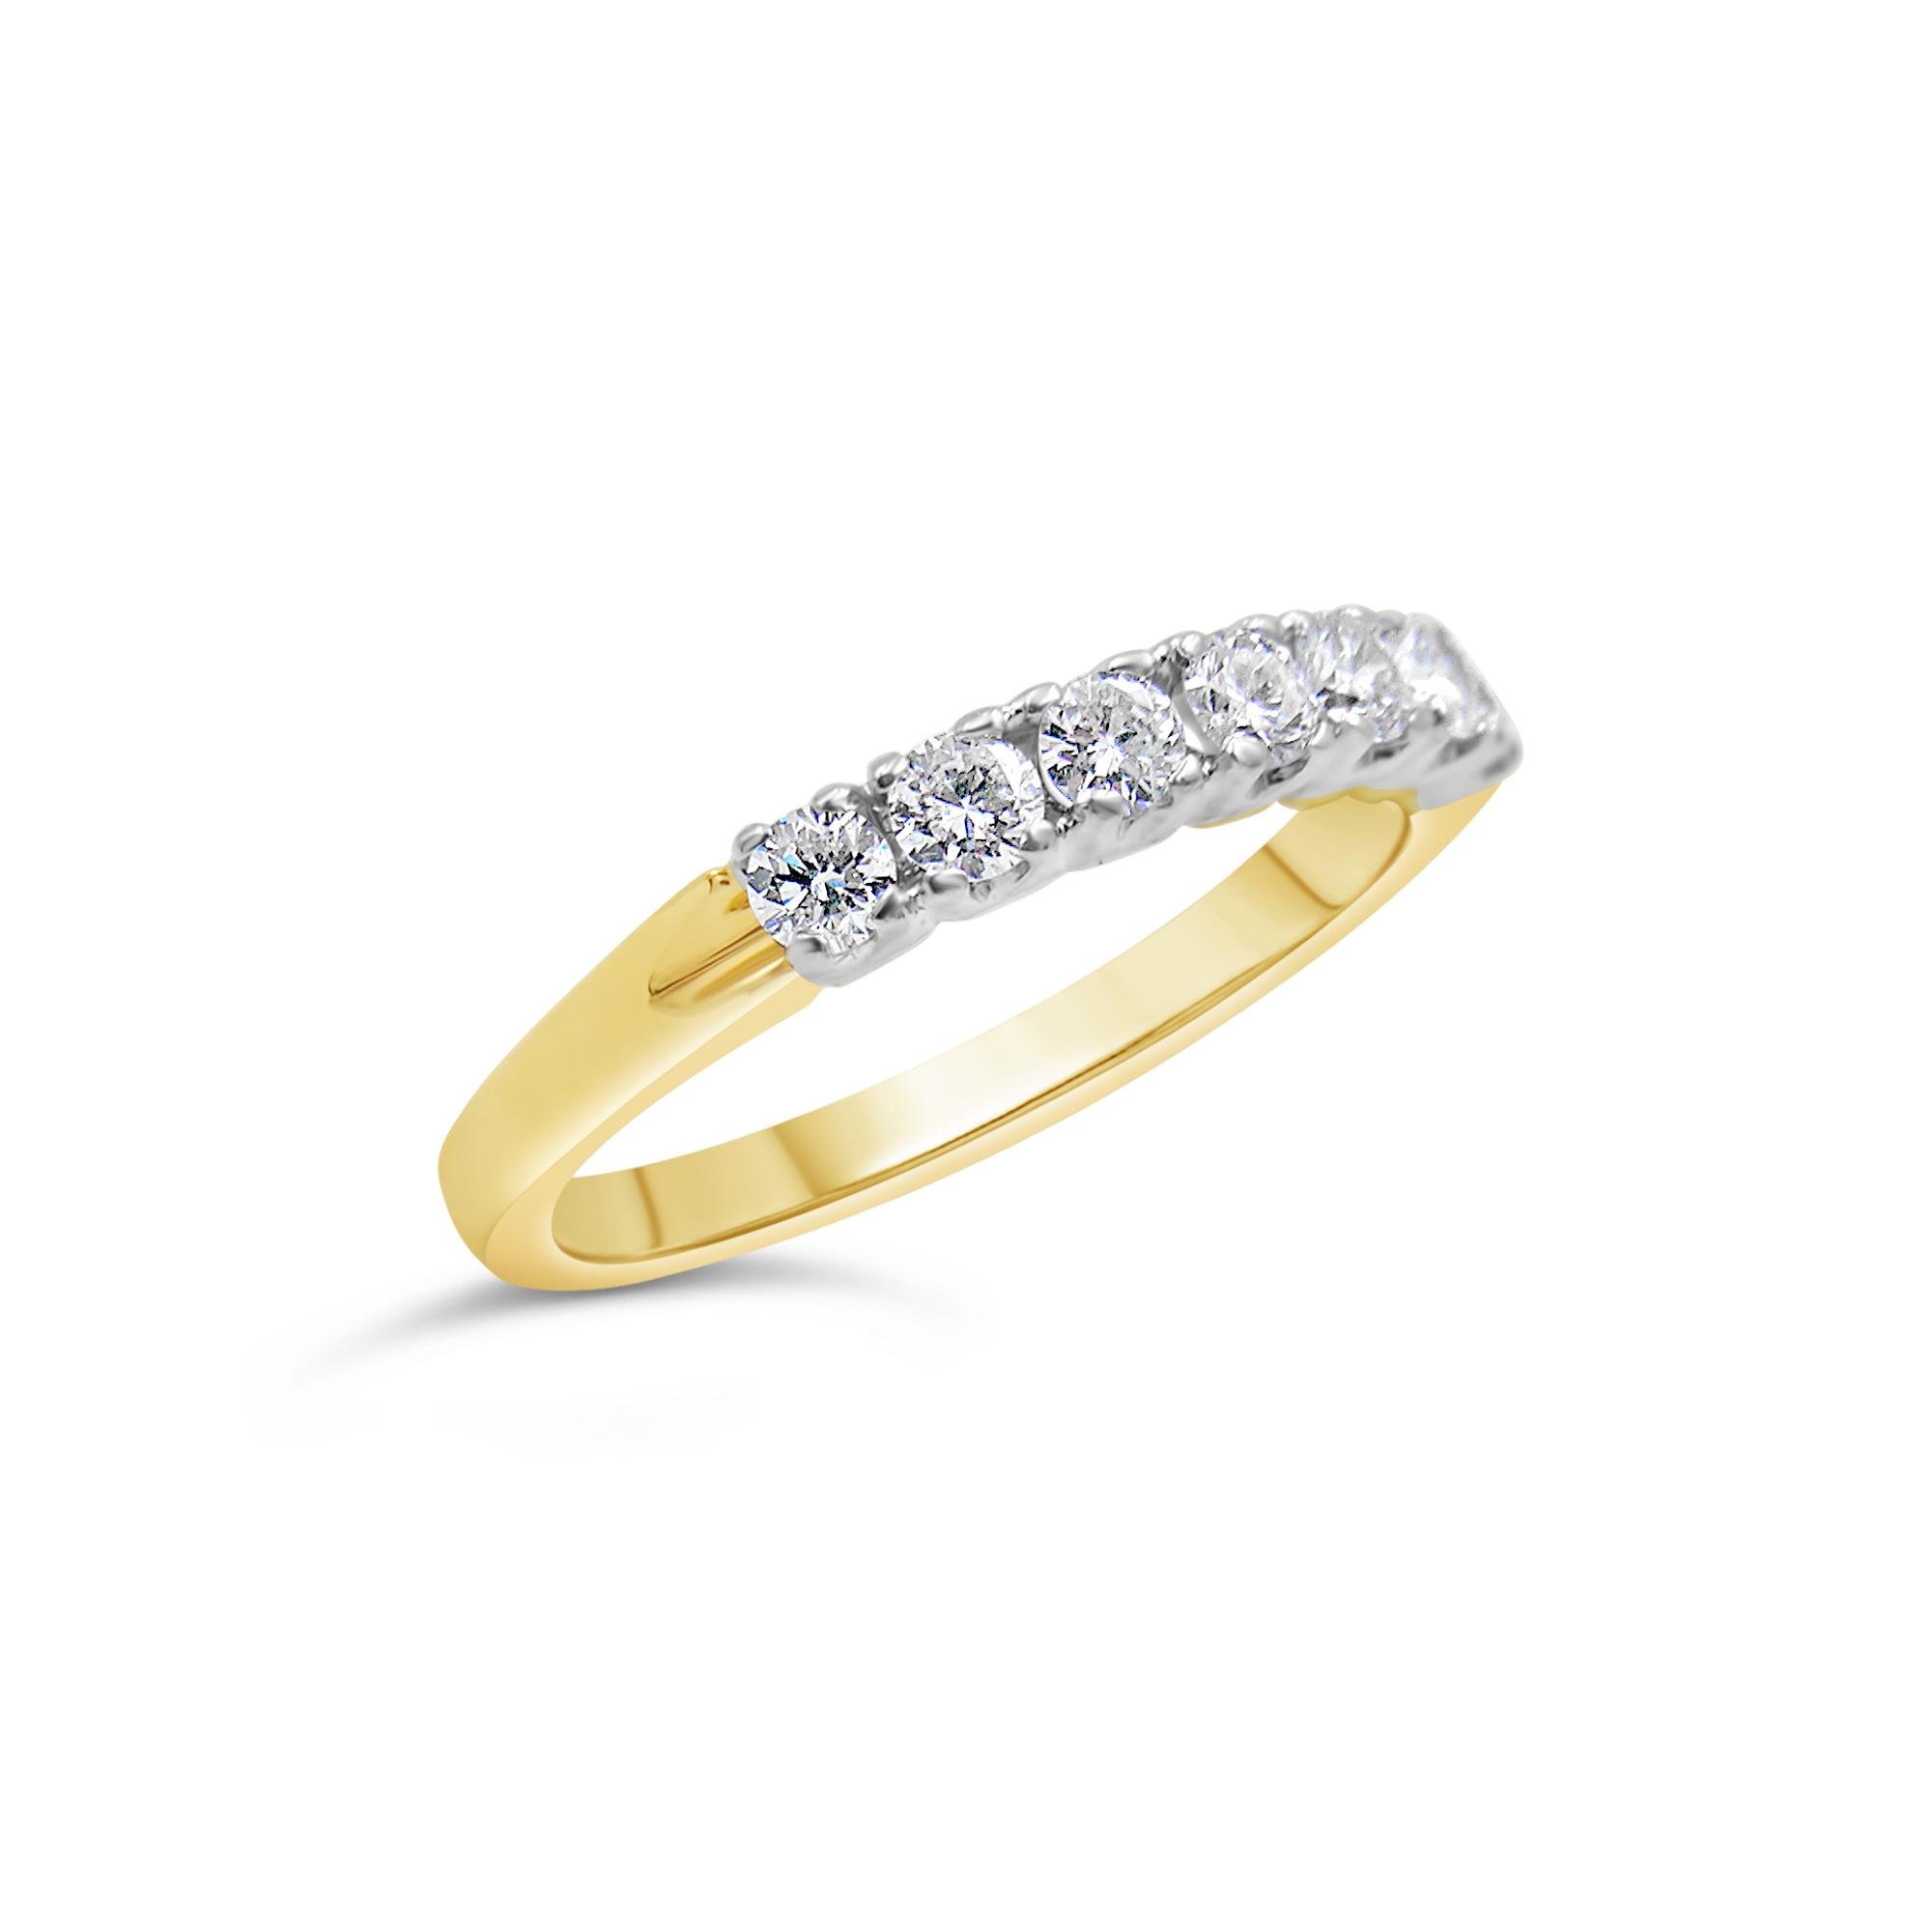 18k yellow & white gold ring with 0.60 ct diamonds